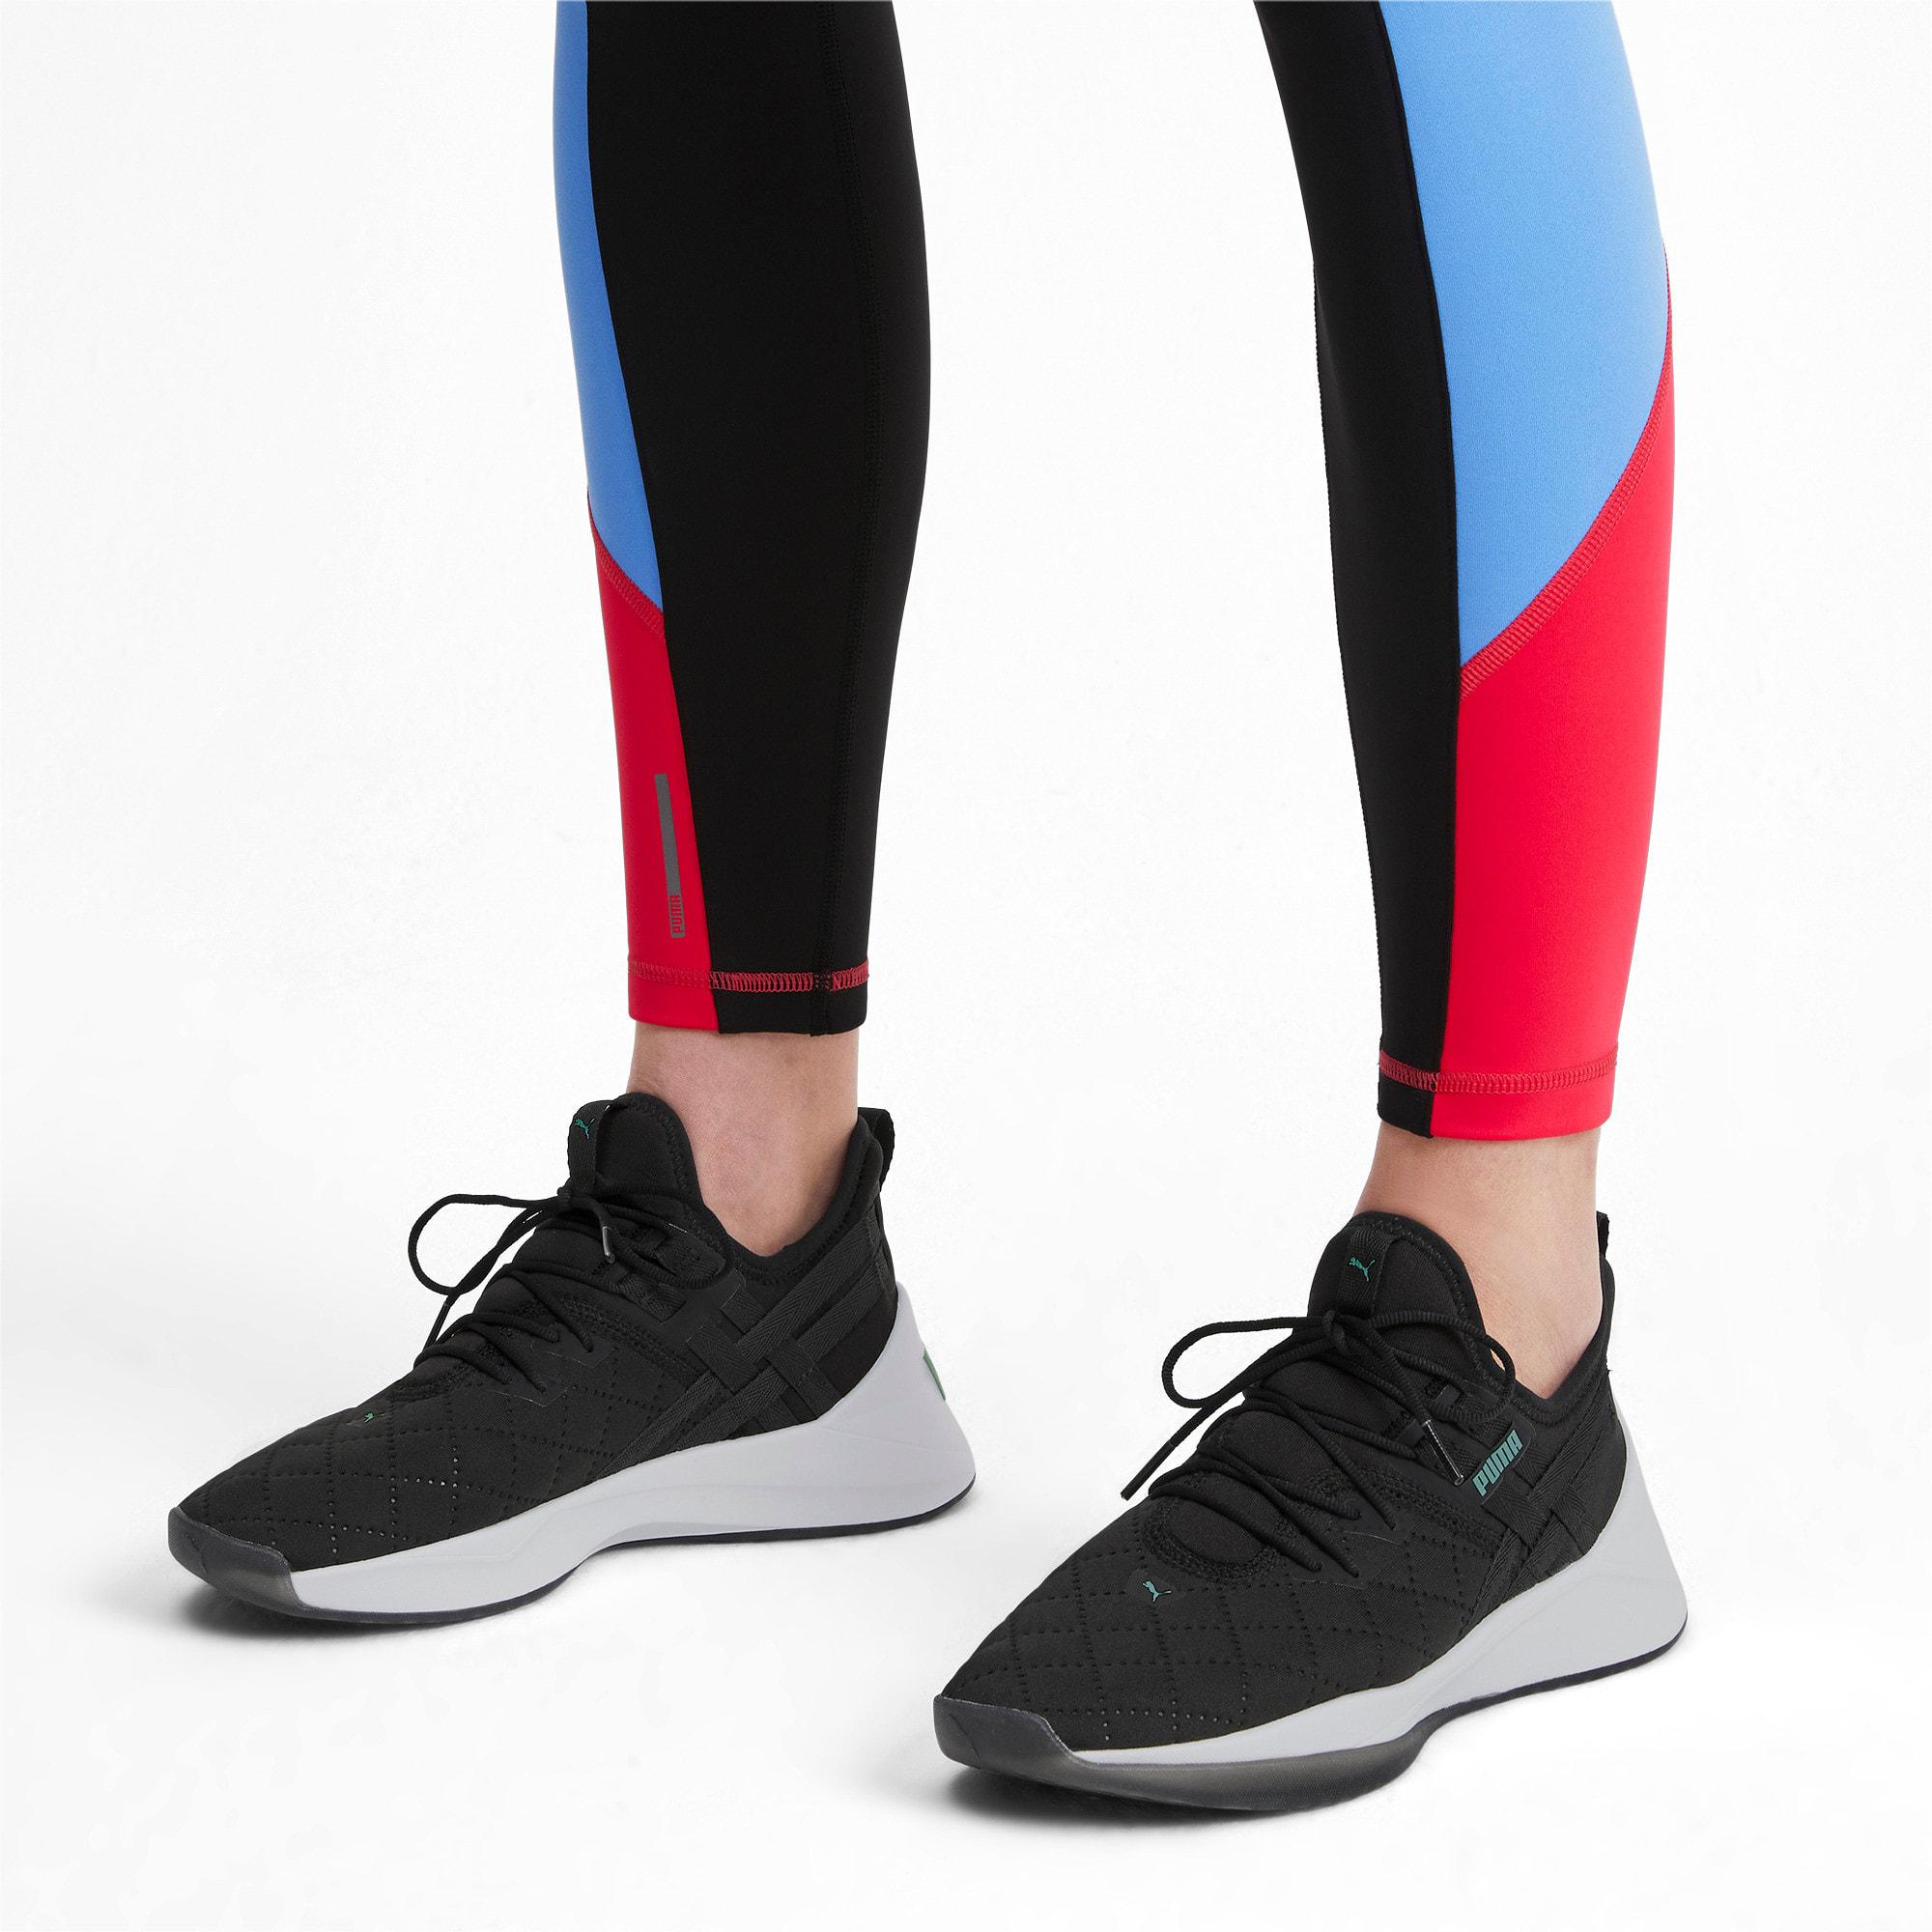 Thumbnail 3 of Jaab XT Quilt Women's Training Shoes, Puma Black-Puma White, medium